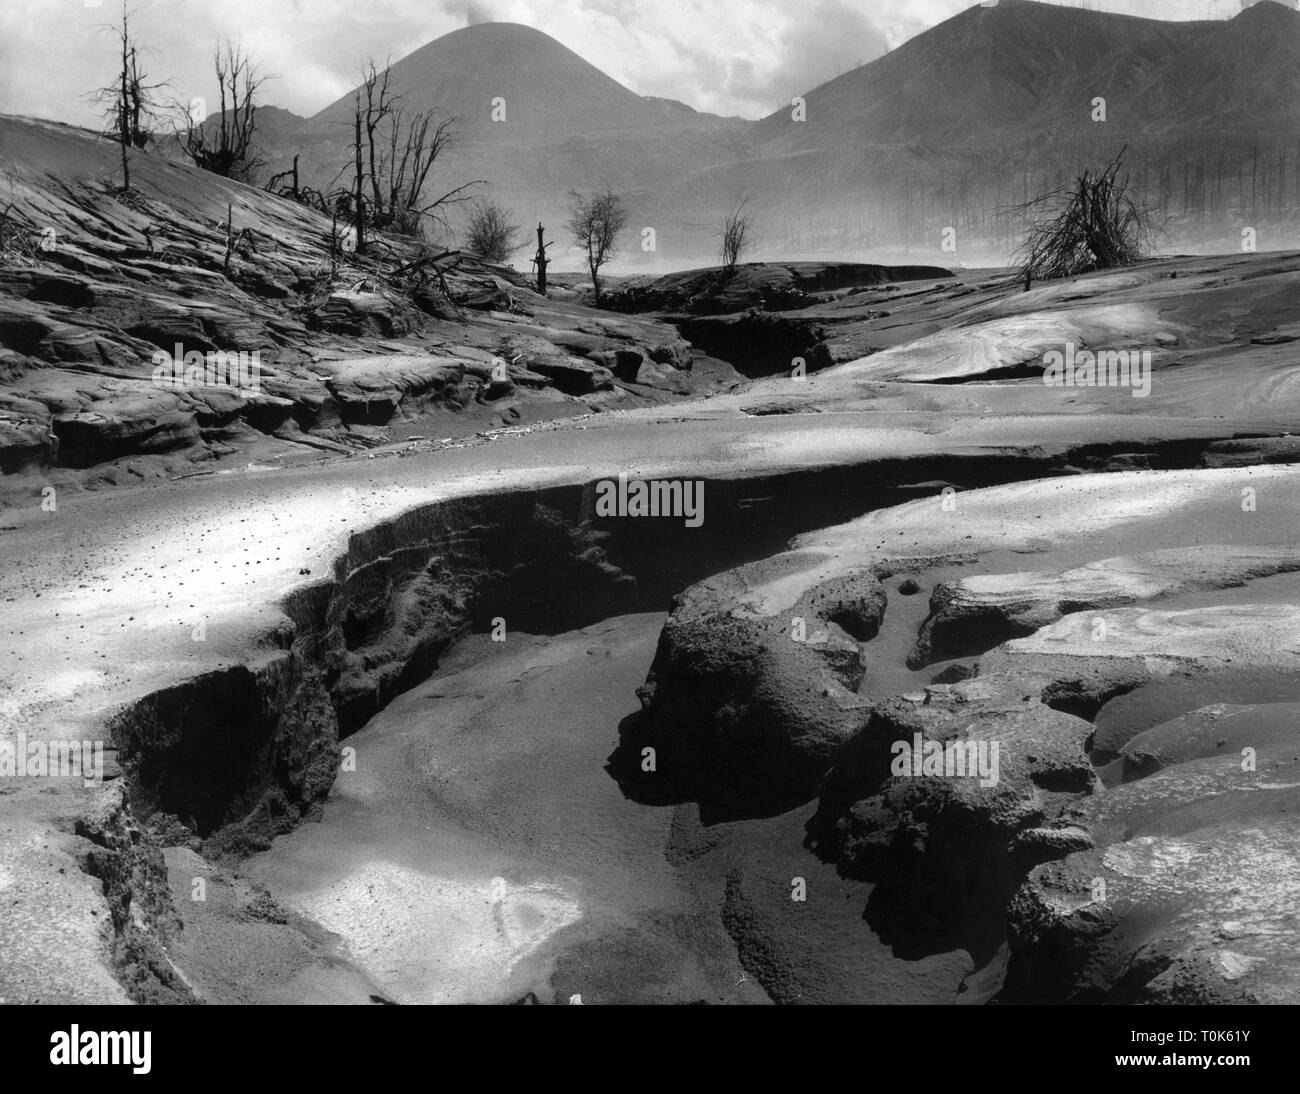 Geographie/Reisen, Mexiko, Landschaften, Lava und Asche, 1950er Jahre, Additional-Rights - Clearance-Info - Not-Available Stockbild